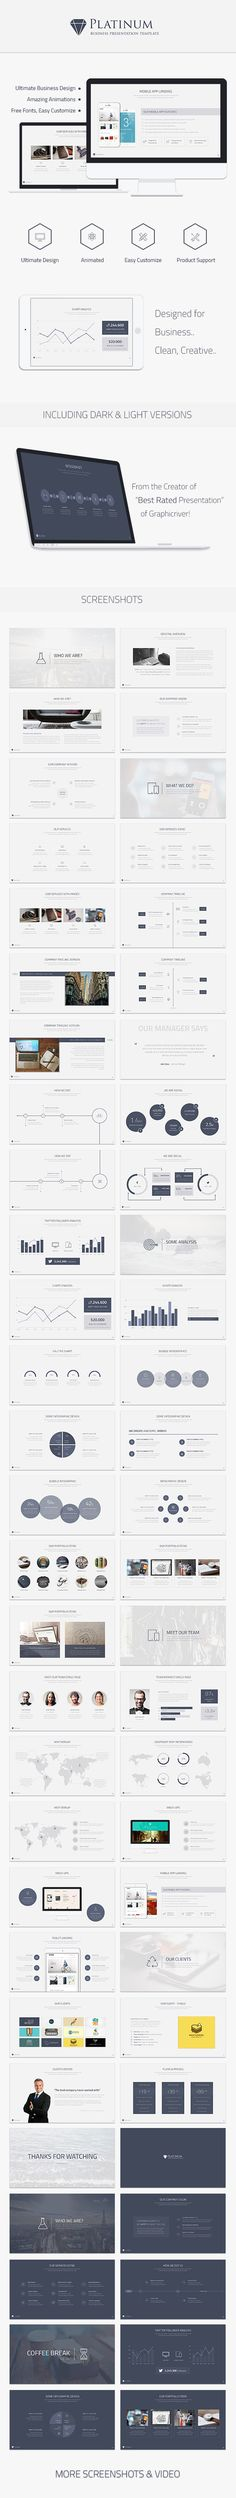 Platinum Business Keynote Template — Keynote KEY #vigitalart #light keynote template • Available here → https://graphicriver.net/item/platinum-business-keynote-template/10021604?ref=pxcr